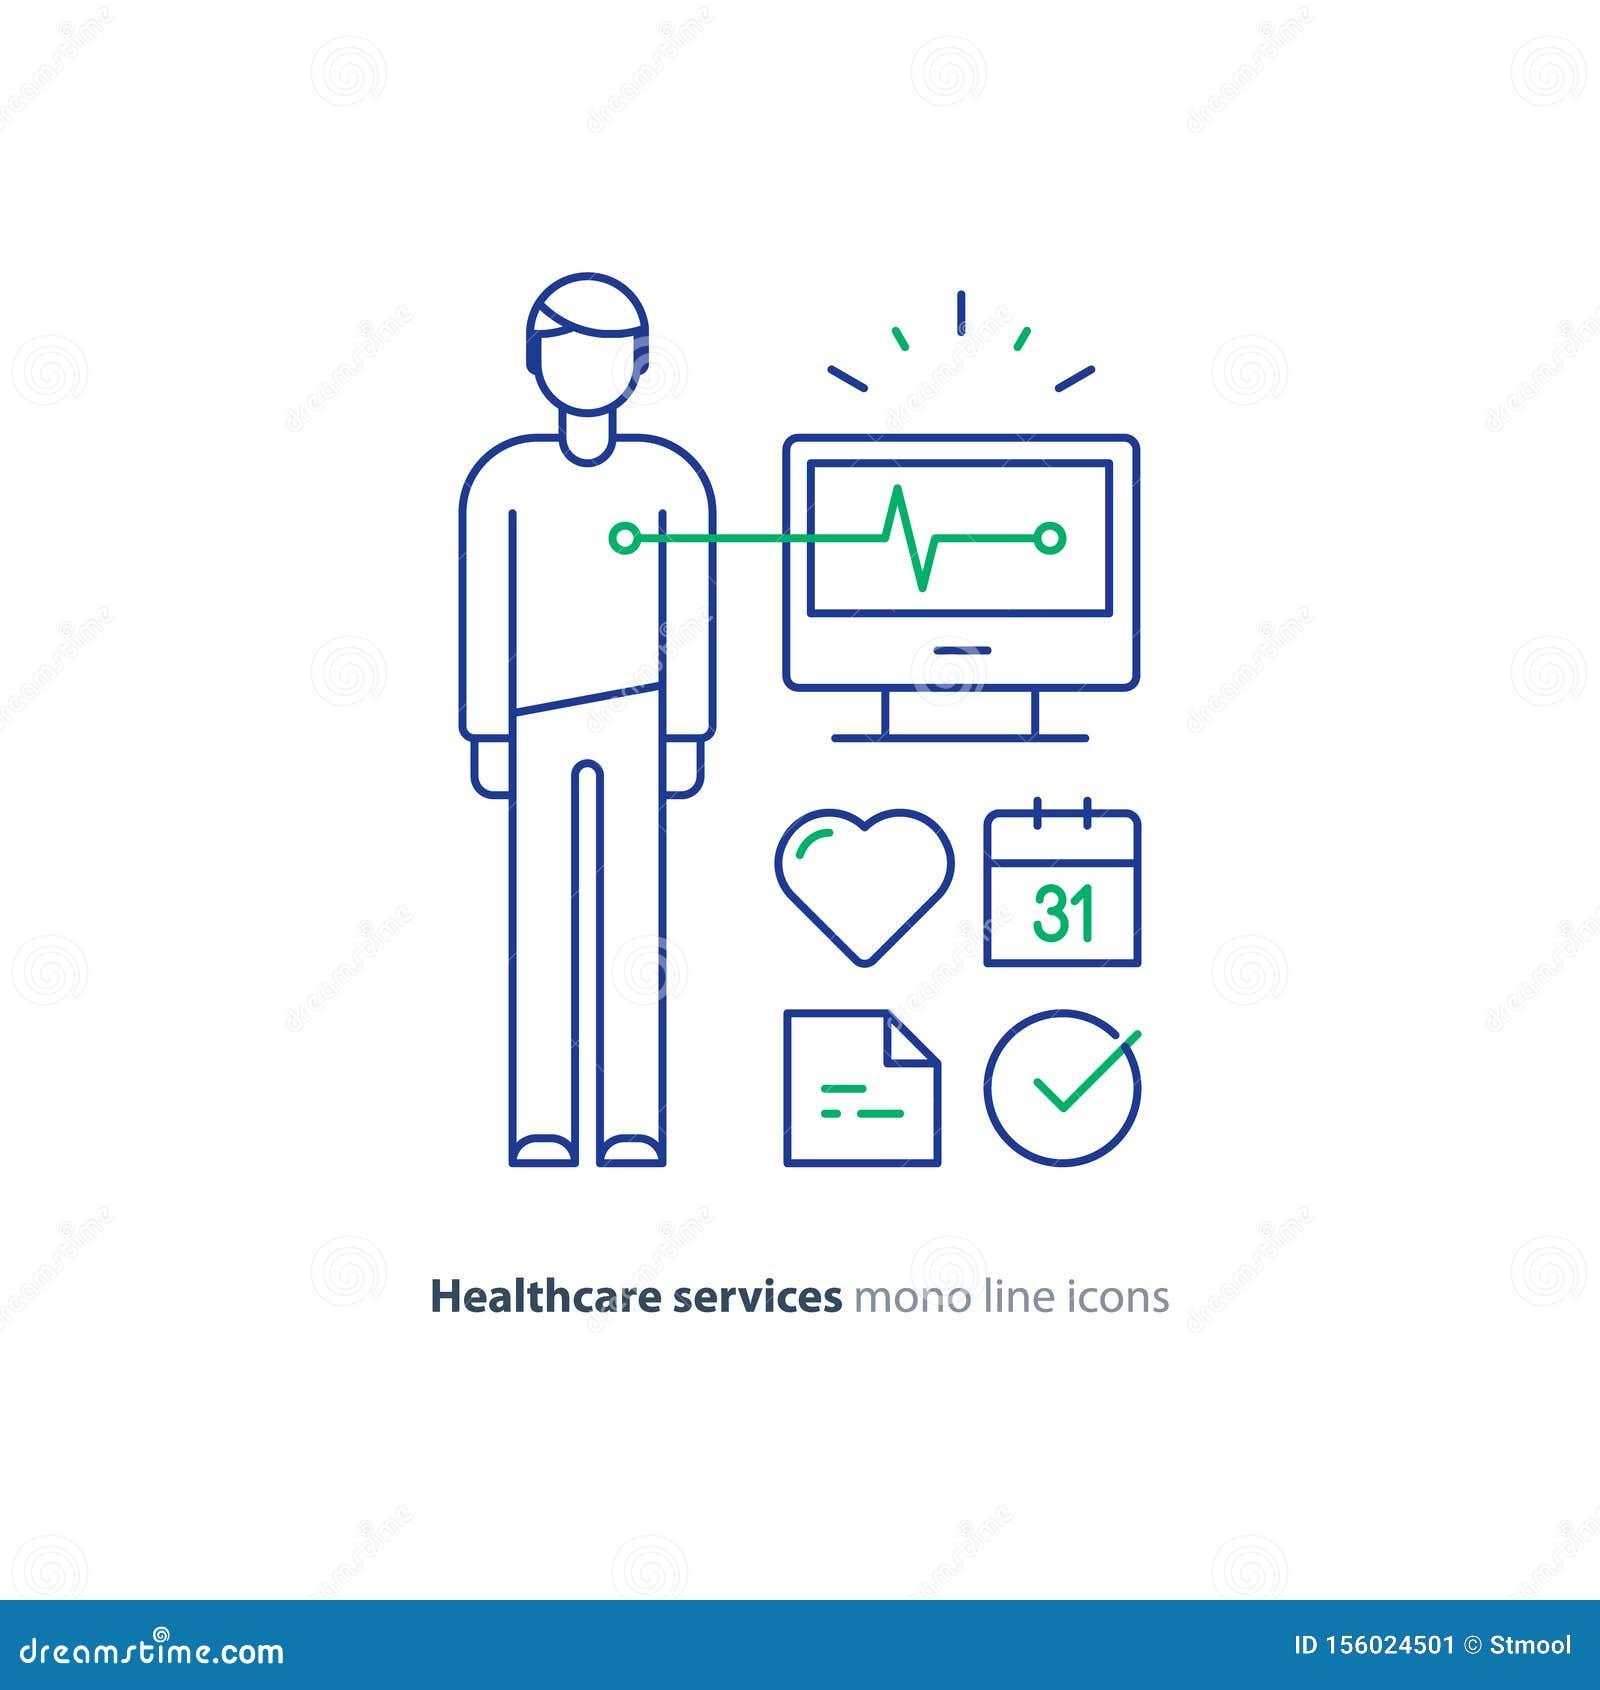 Heart test line icon, electrocardiogram monitor logo, cardiology examination